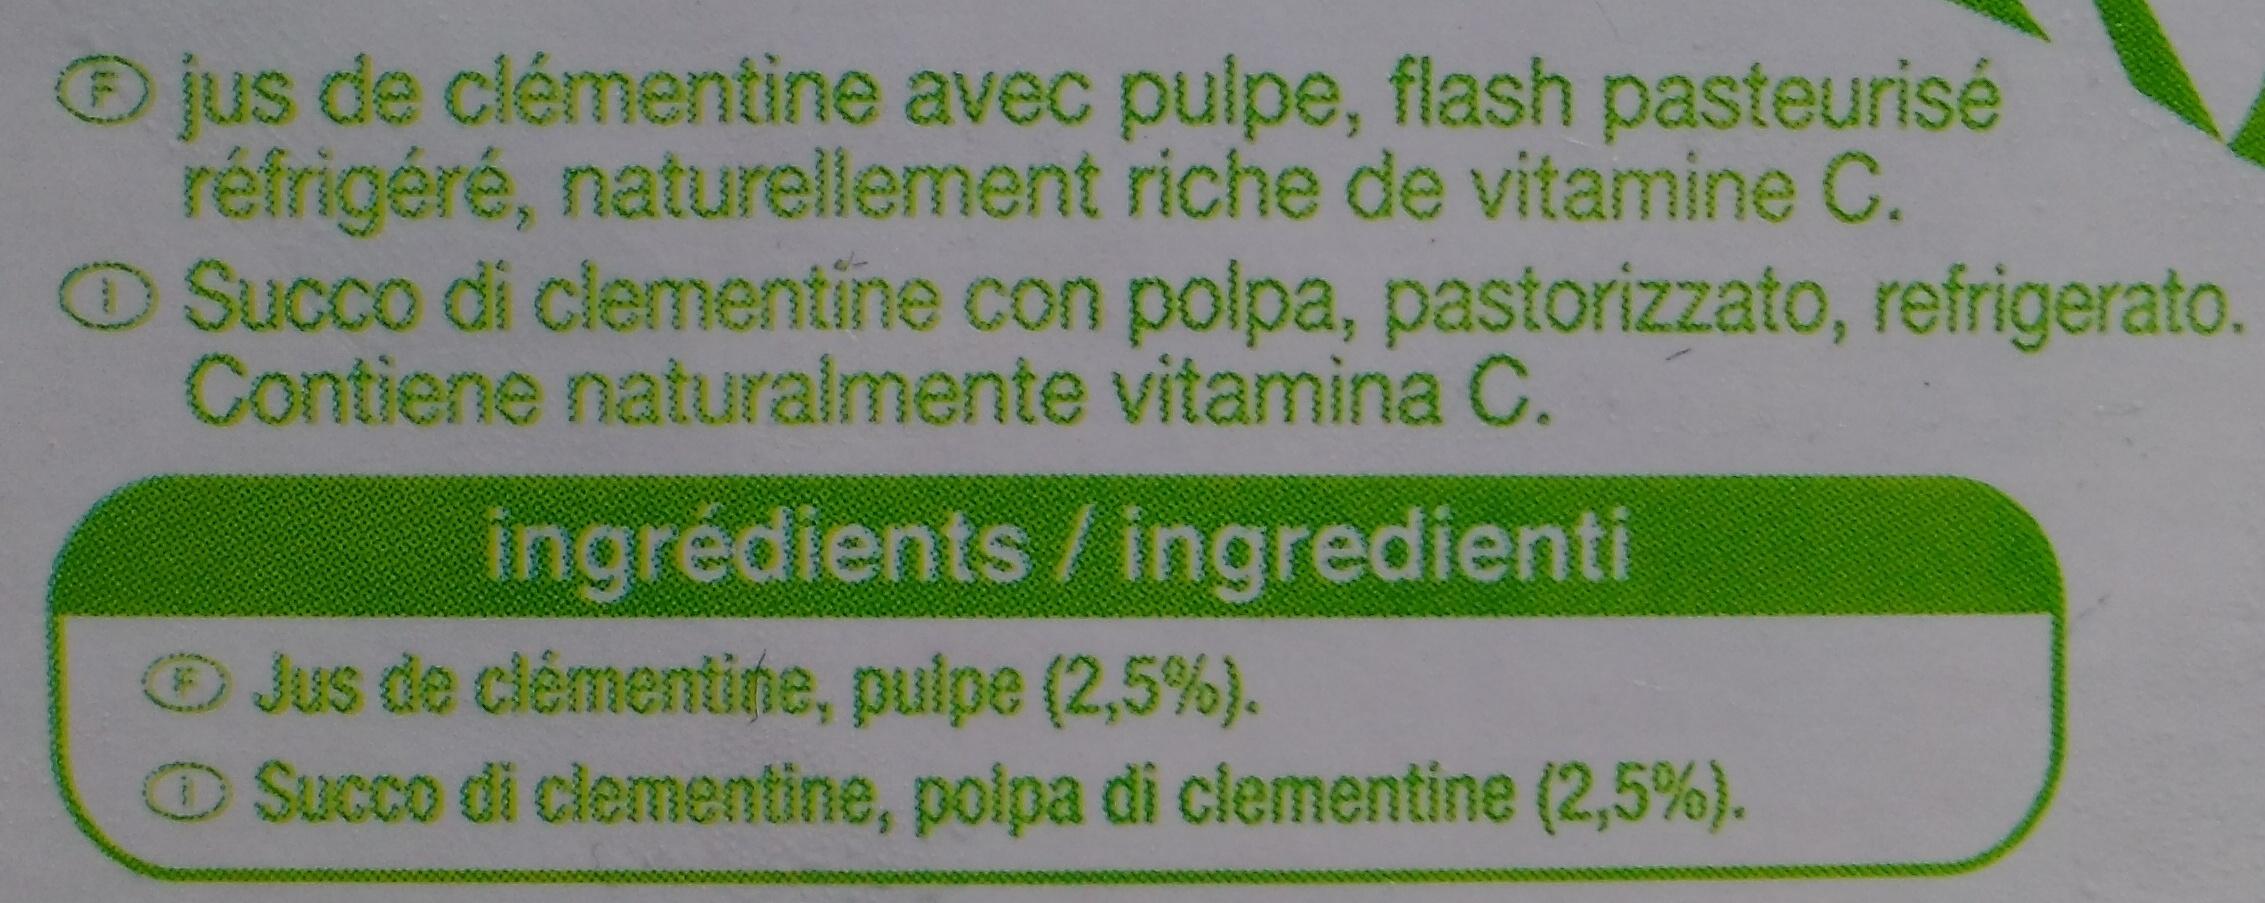 Jus de clémentine 100% jus - Ingrediënten - fr